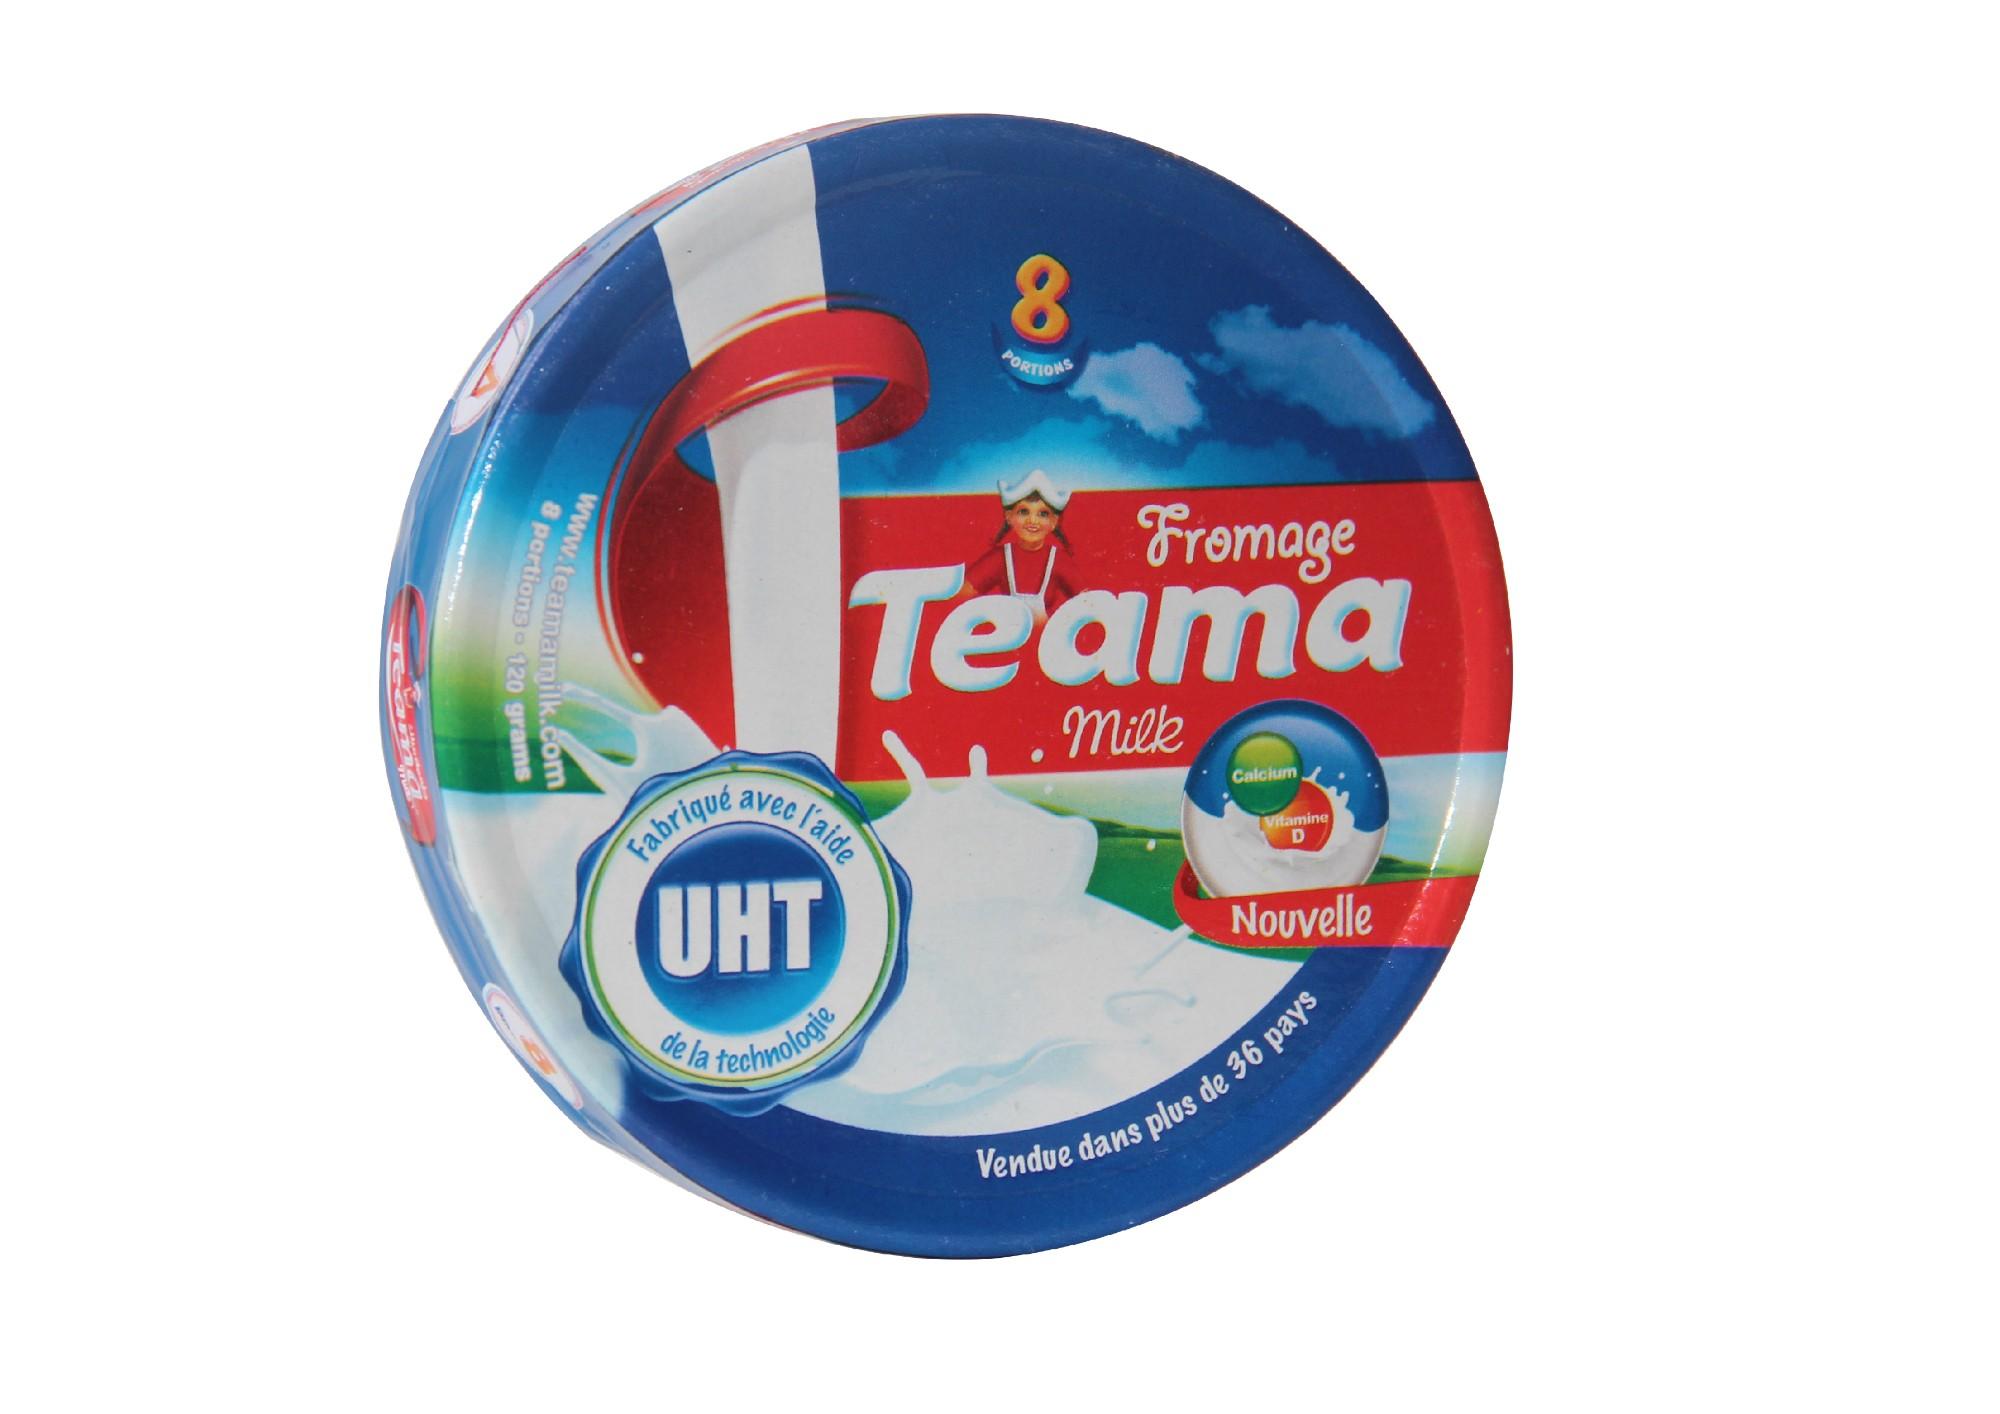 Phomai Teama